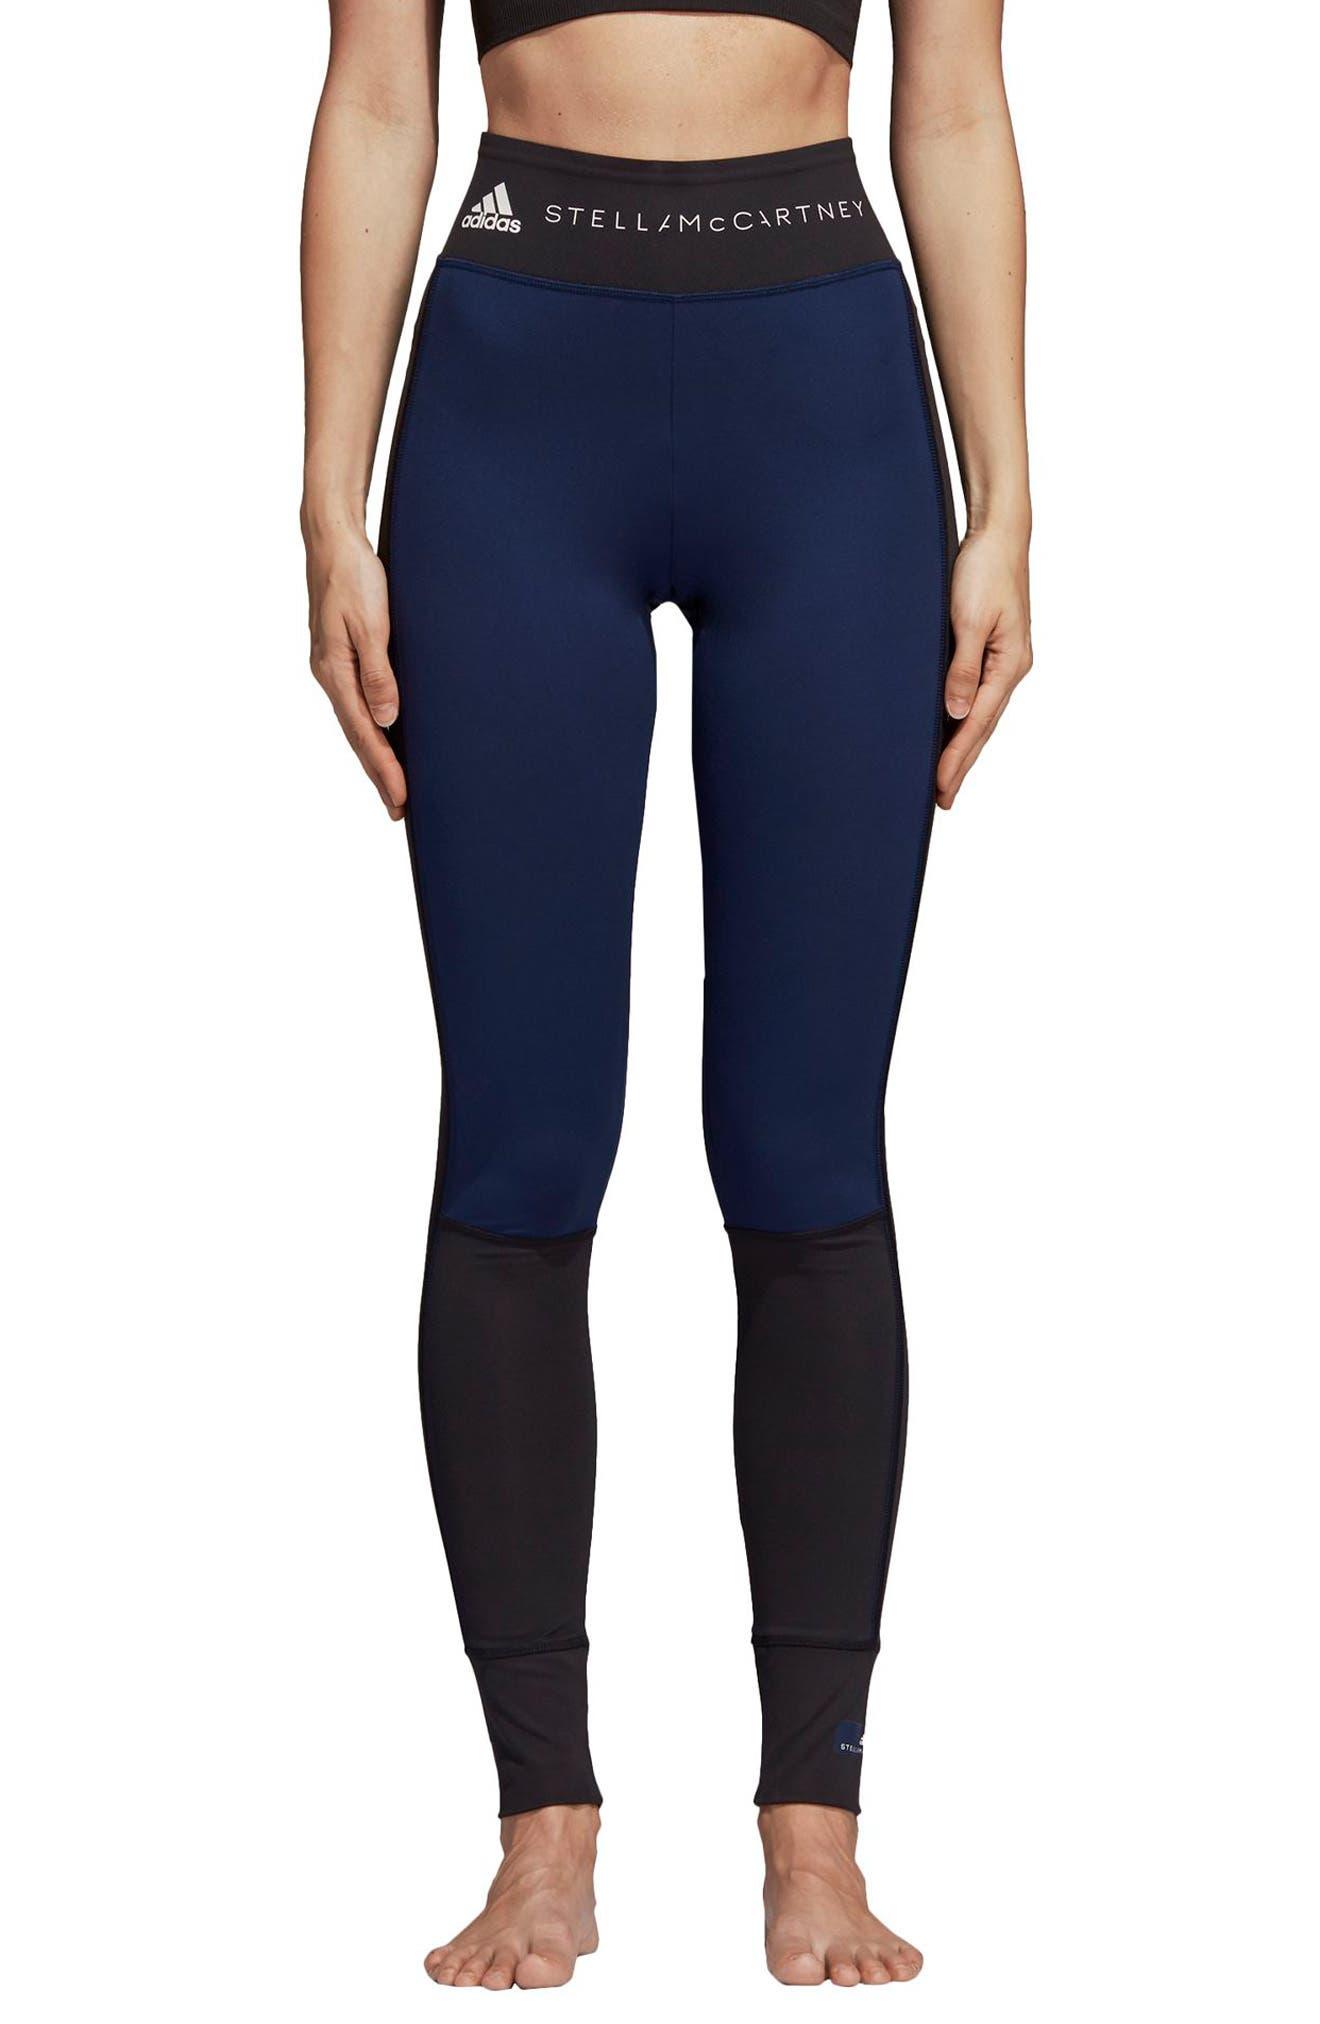 Yoga Comfort Performance Tights,                         Main,                         color, BLACK/ NIND